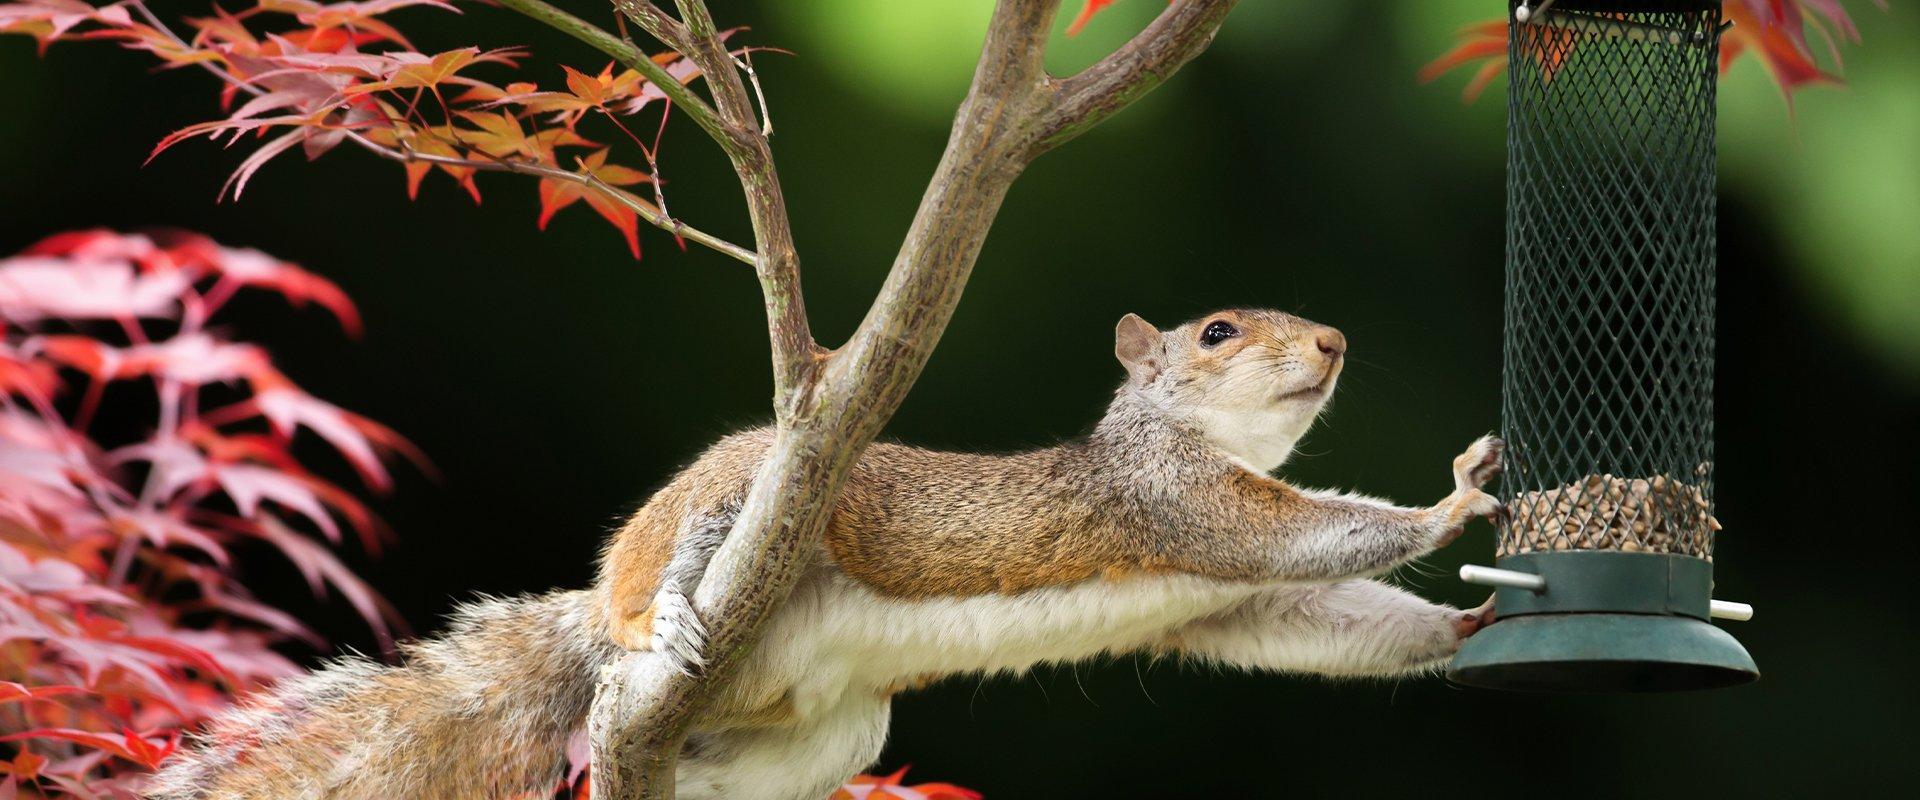 squirrel eating bird food